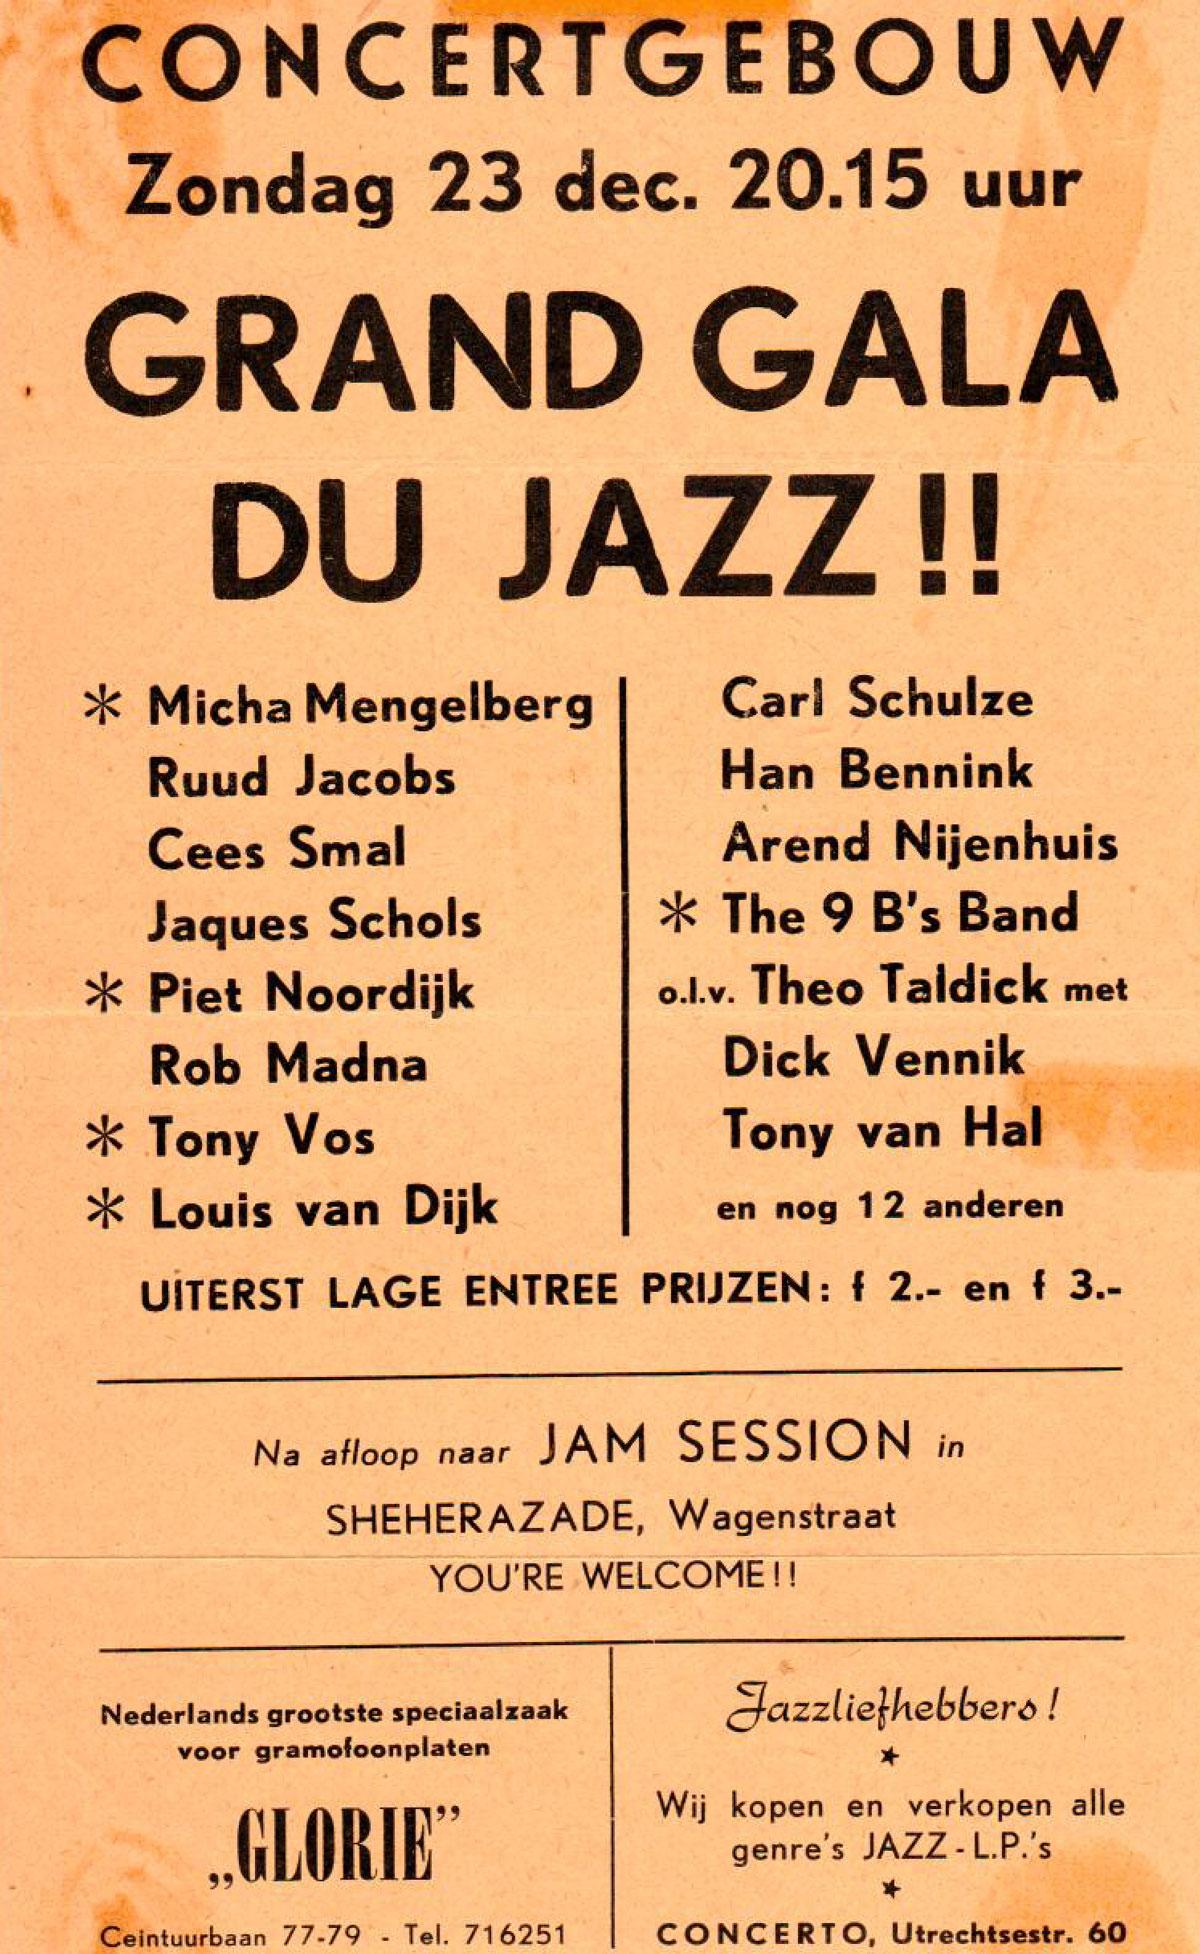 Grand Gala du jazz 1962